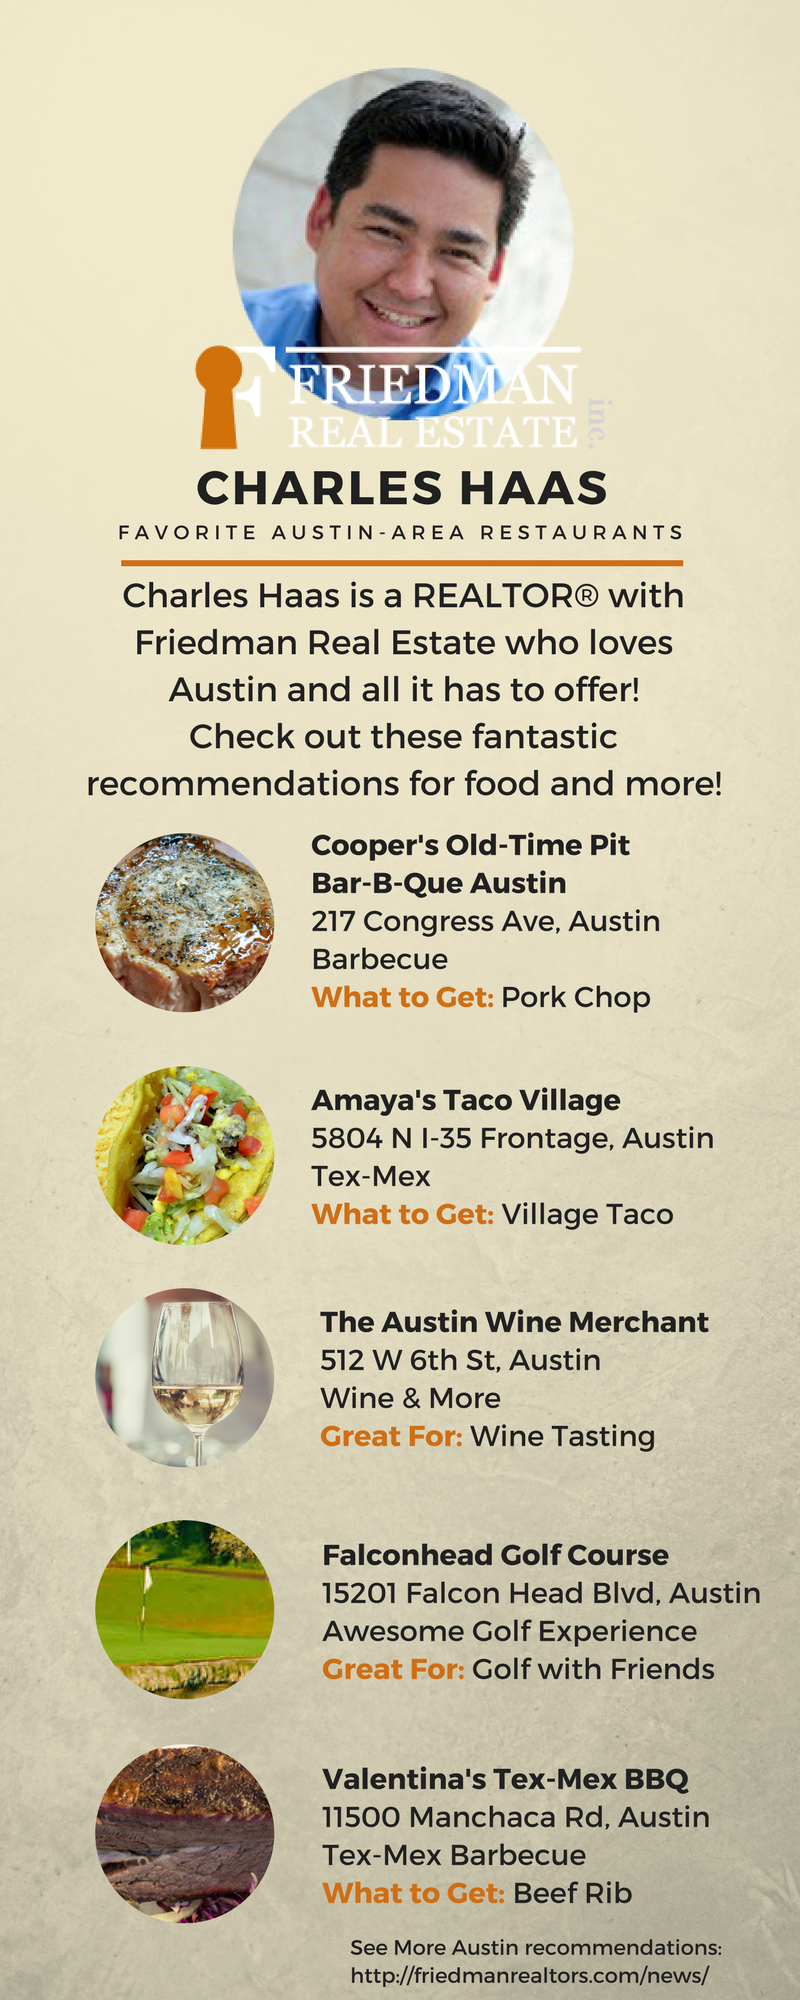 Charles-Haas-Friedman-Real-Estate-Austin-Favorite-Places